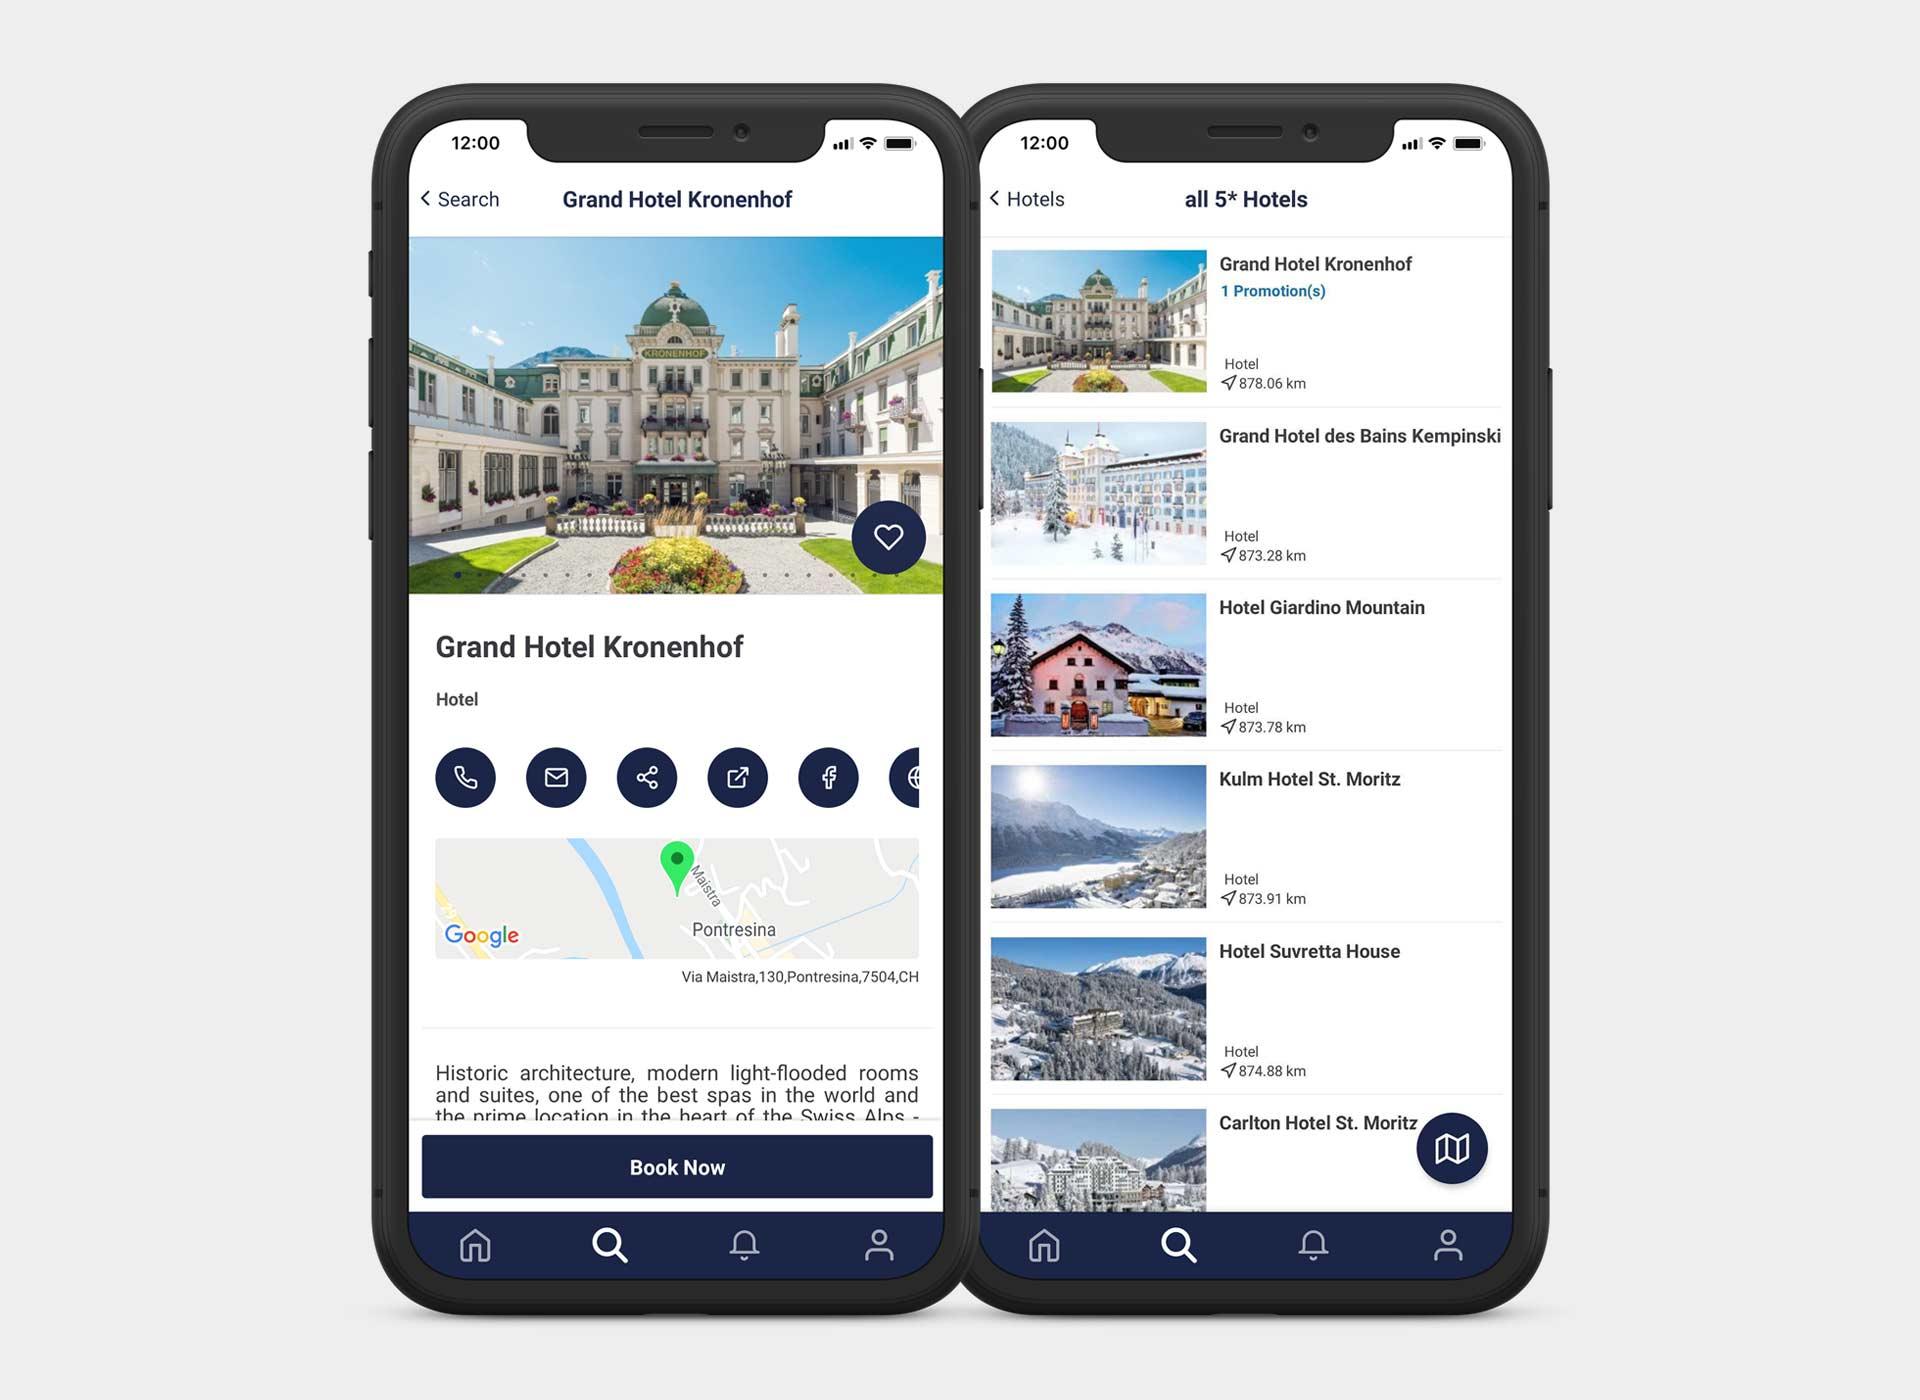 mobile-apps-development-company-builder-tracking-design-creator-app-application-3